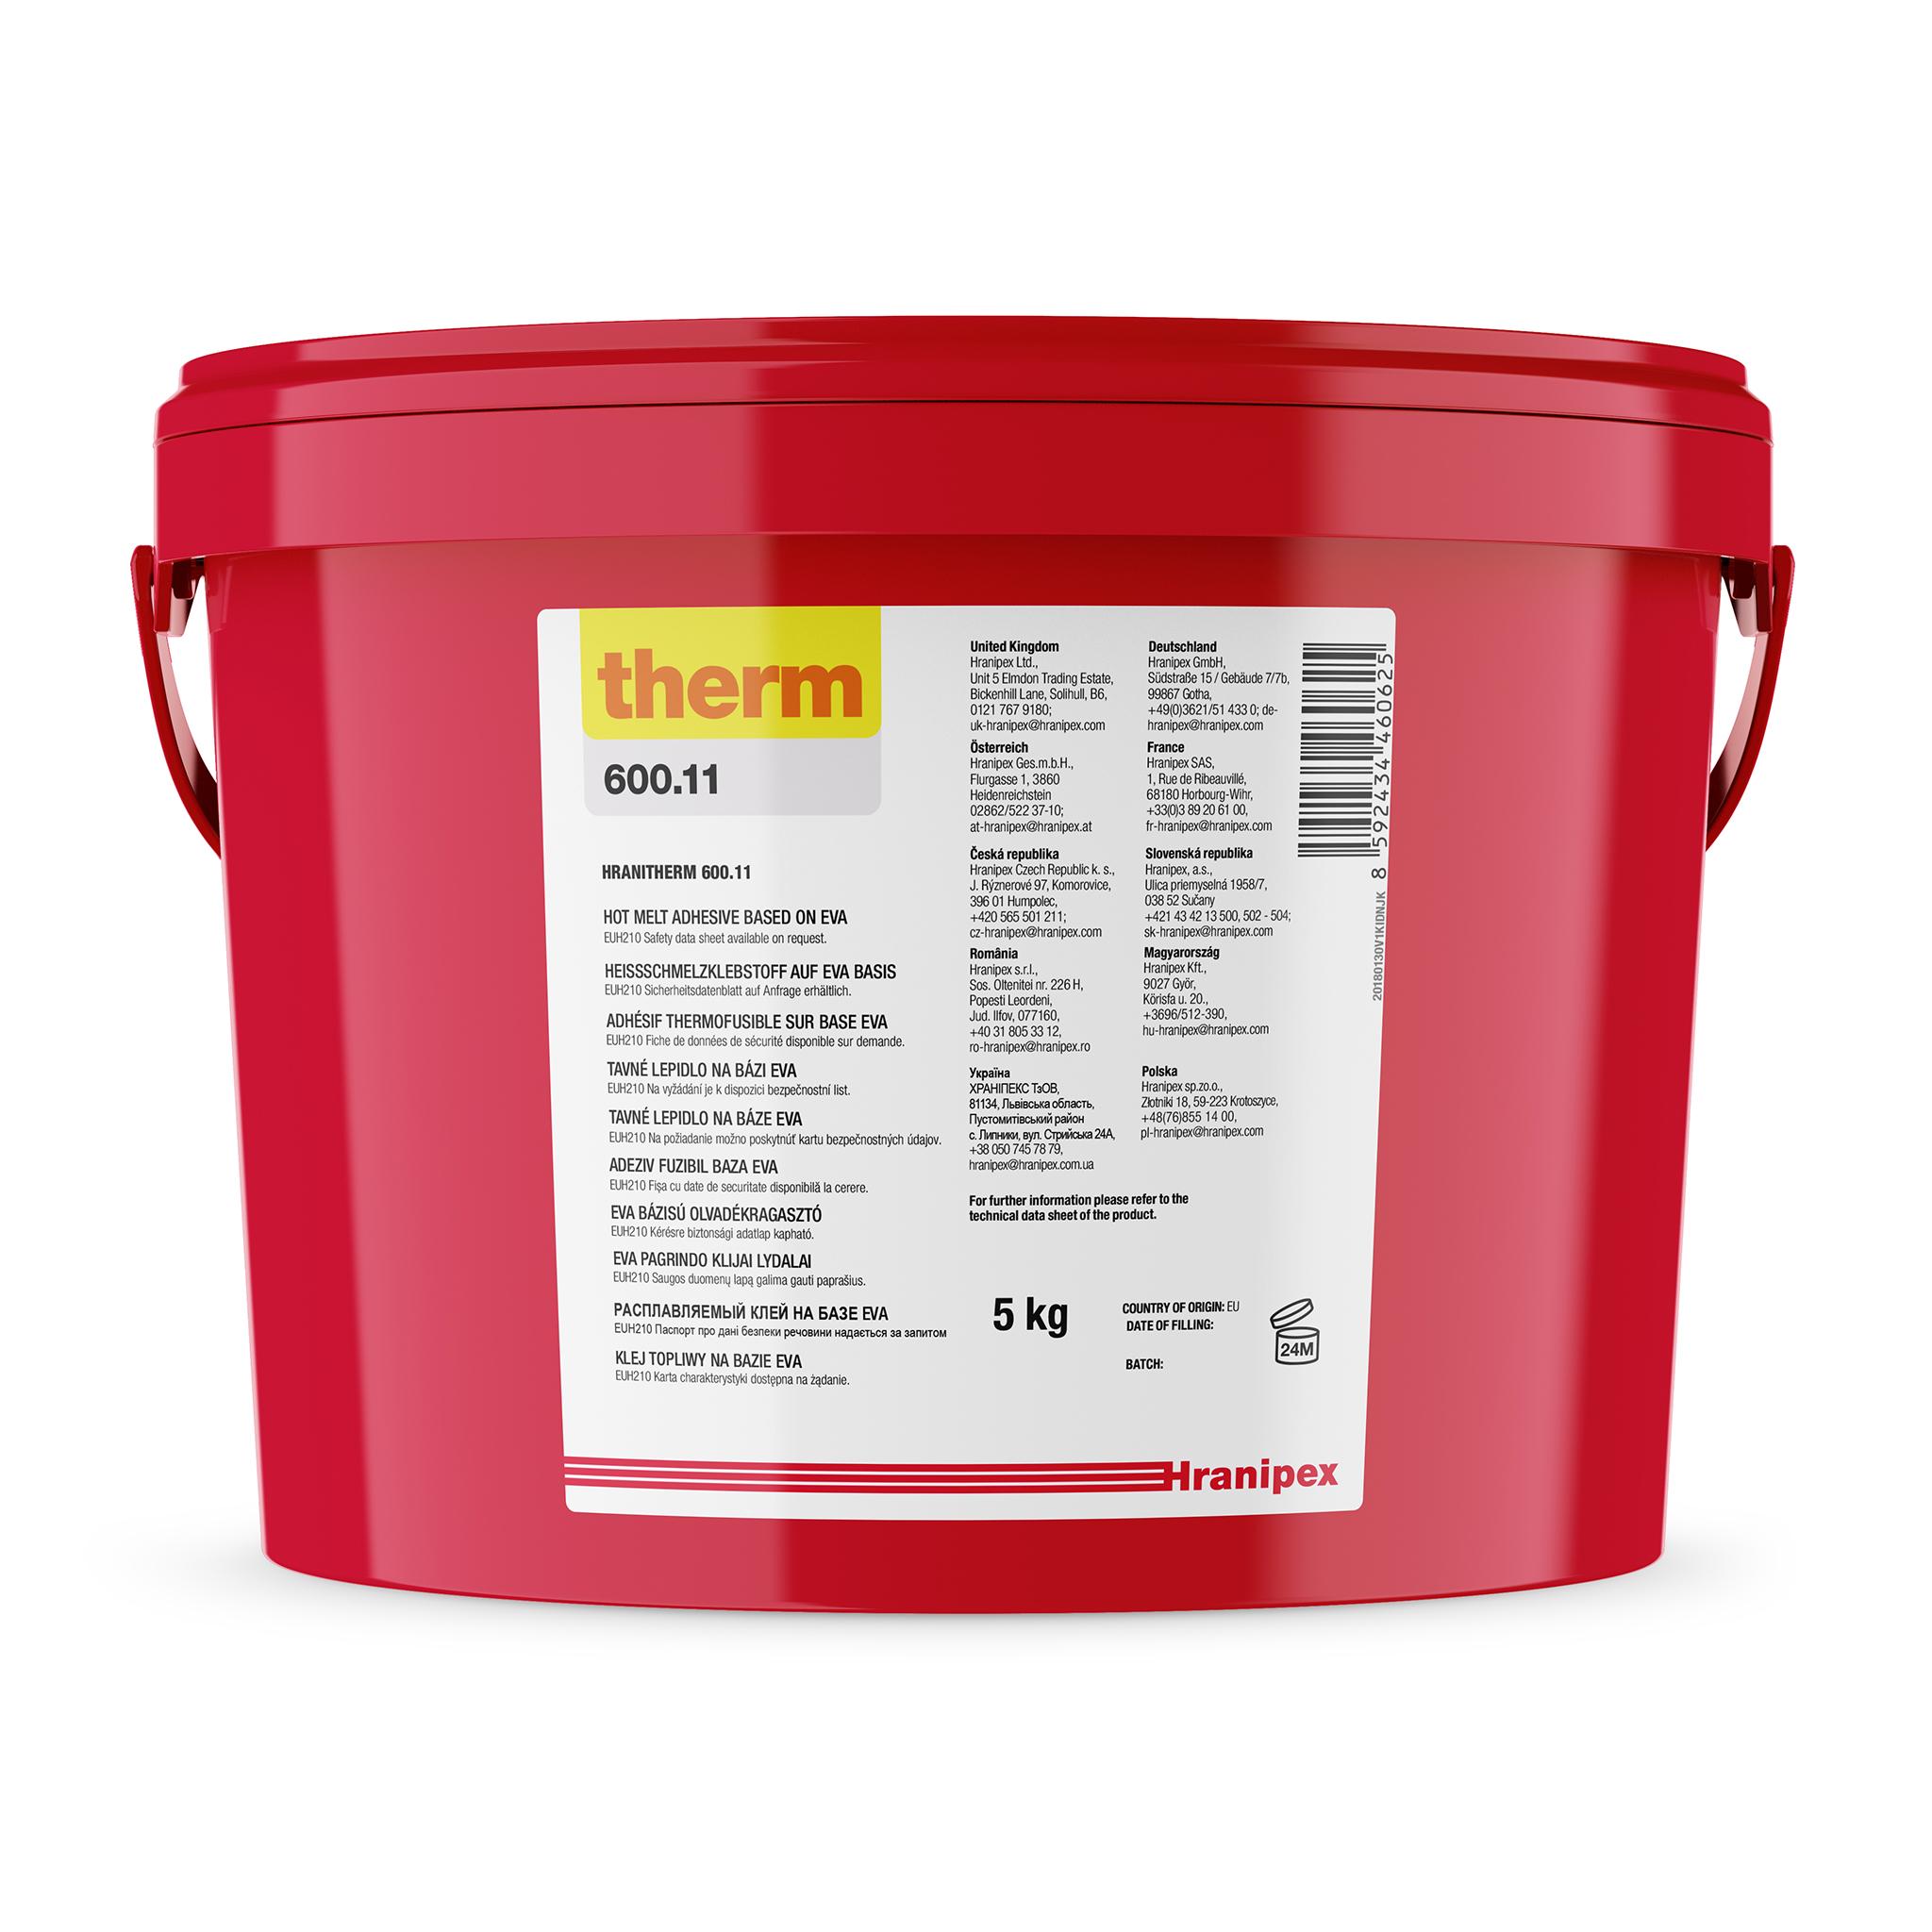 HRANITHERM 600.11 Blanc - EVA Thermofusible 5 kg granule